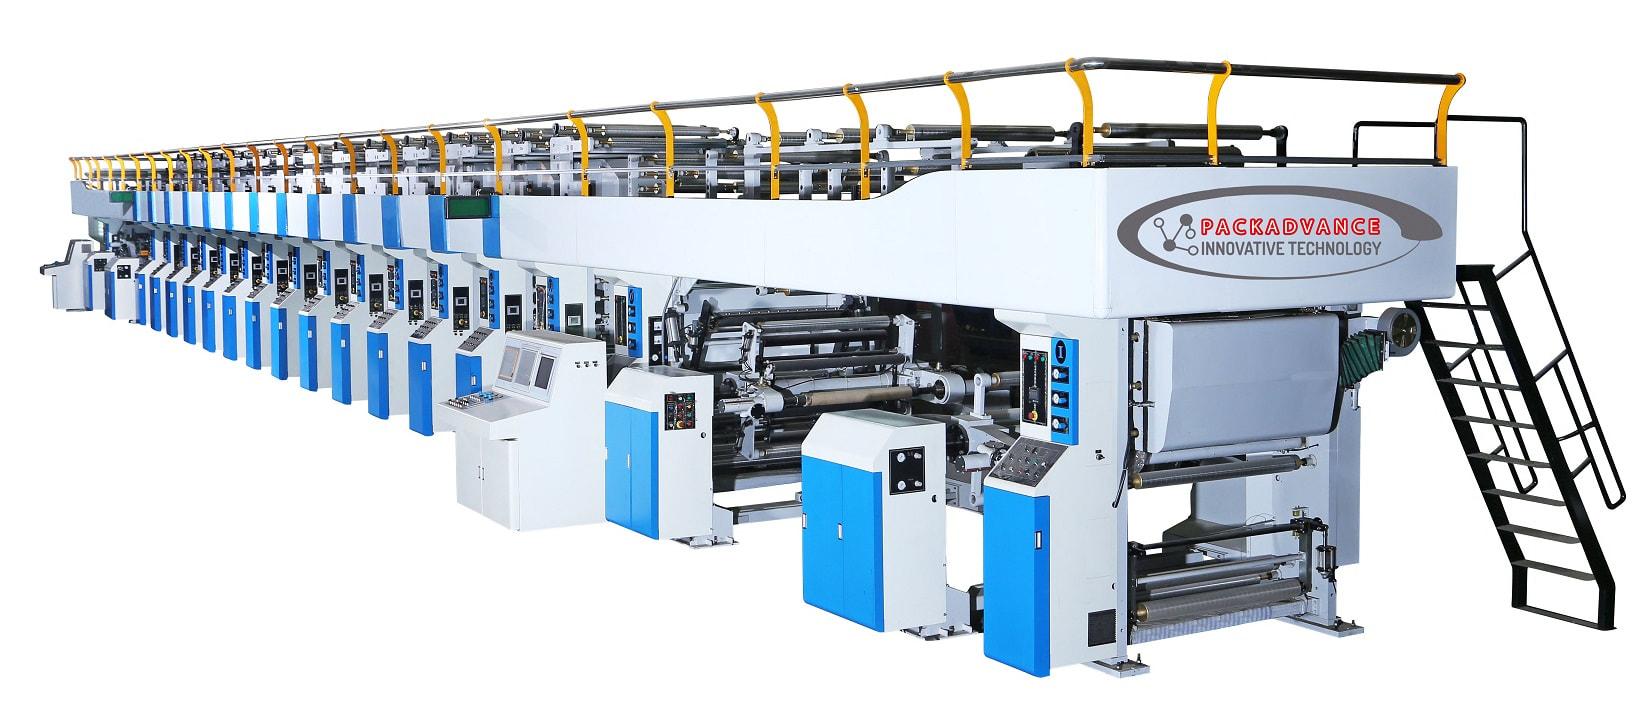 rotogravure printing machines packadvance innovative technology